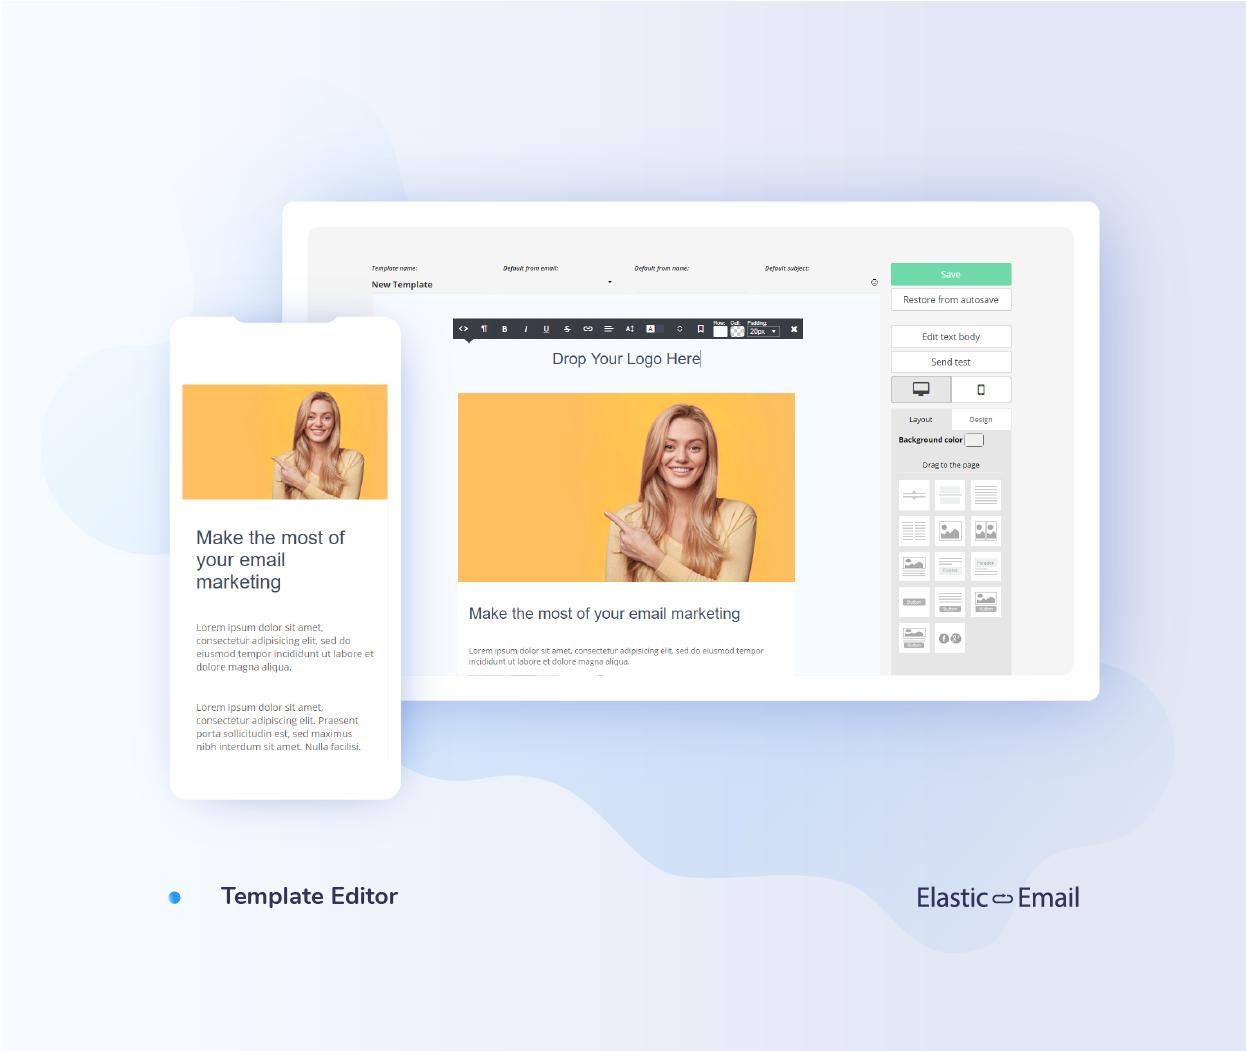 Elastic Email Demo - Make your design ideas come to life